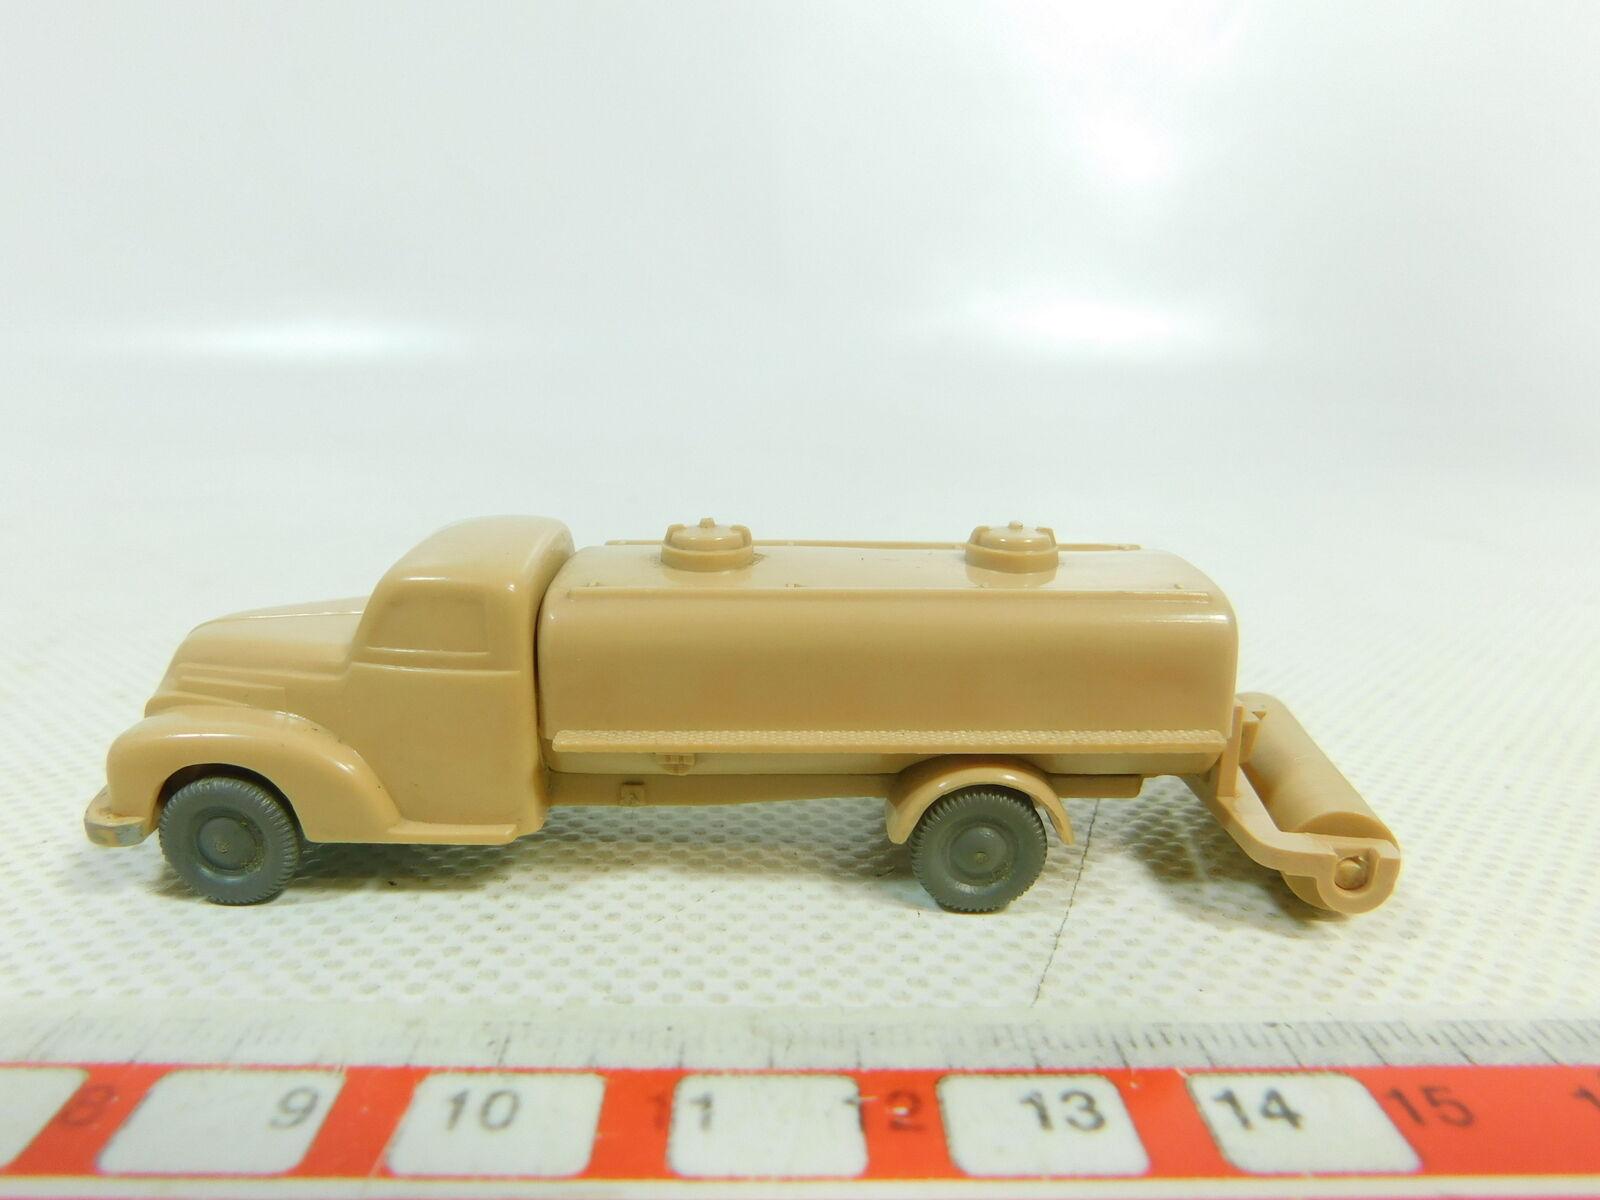 Bh743-0, 5 ; mit h0 1 87 3500 Ford Trucks Modelll Panel; 640 2; s.g